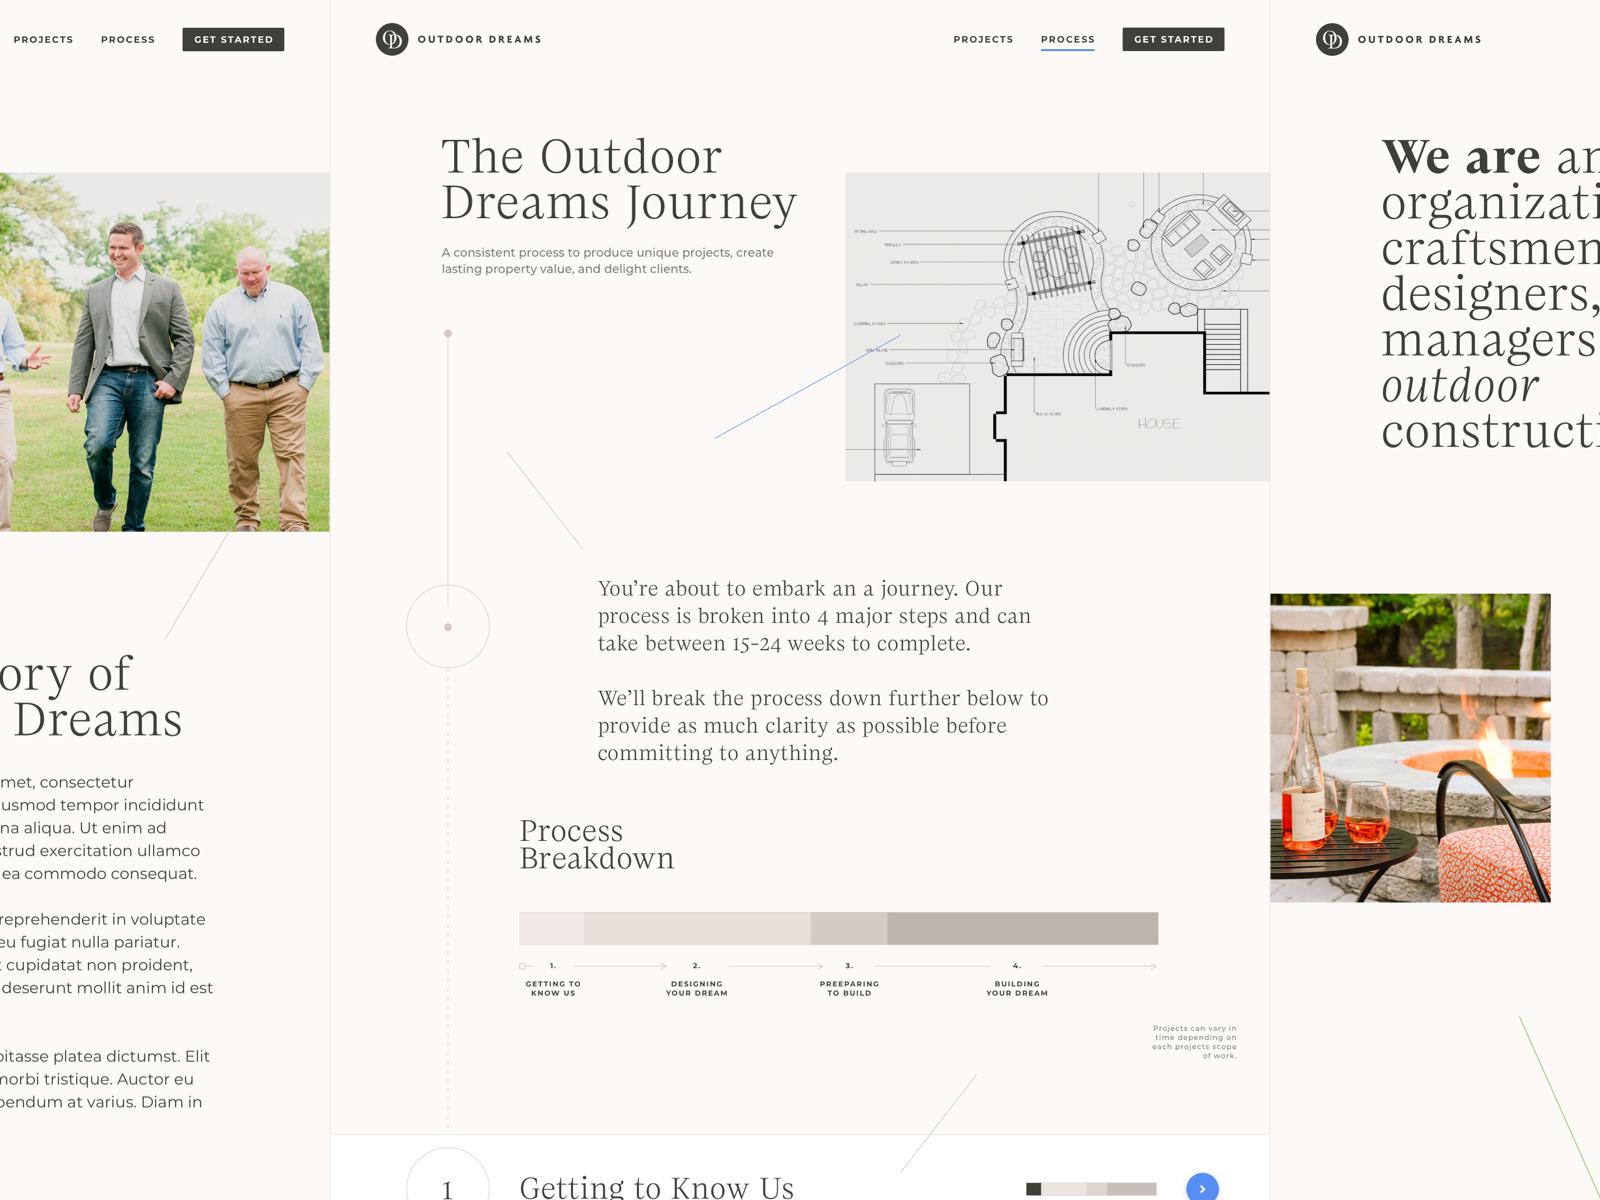 db_page layout